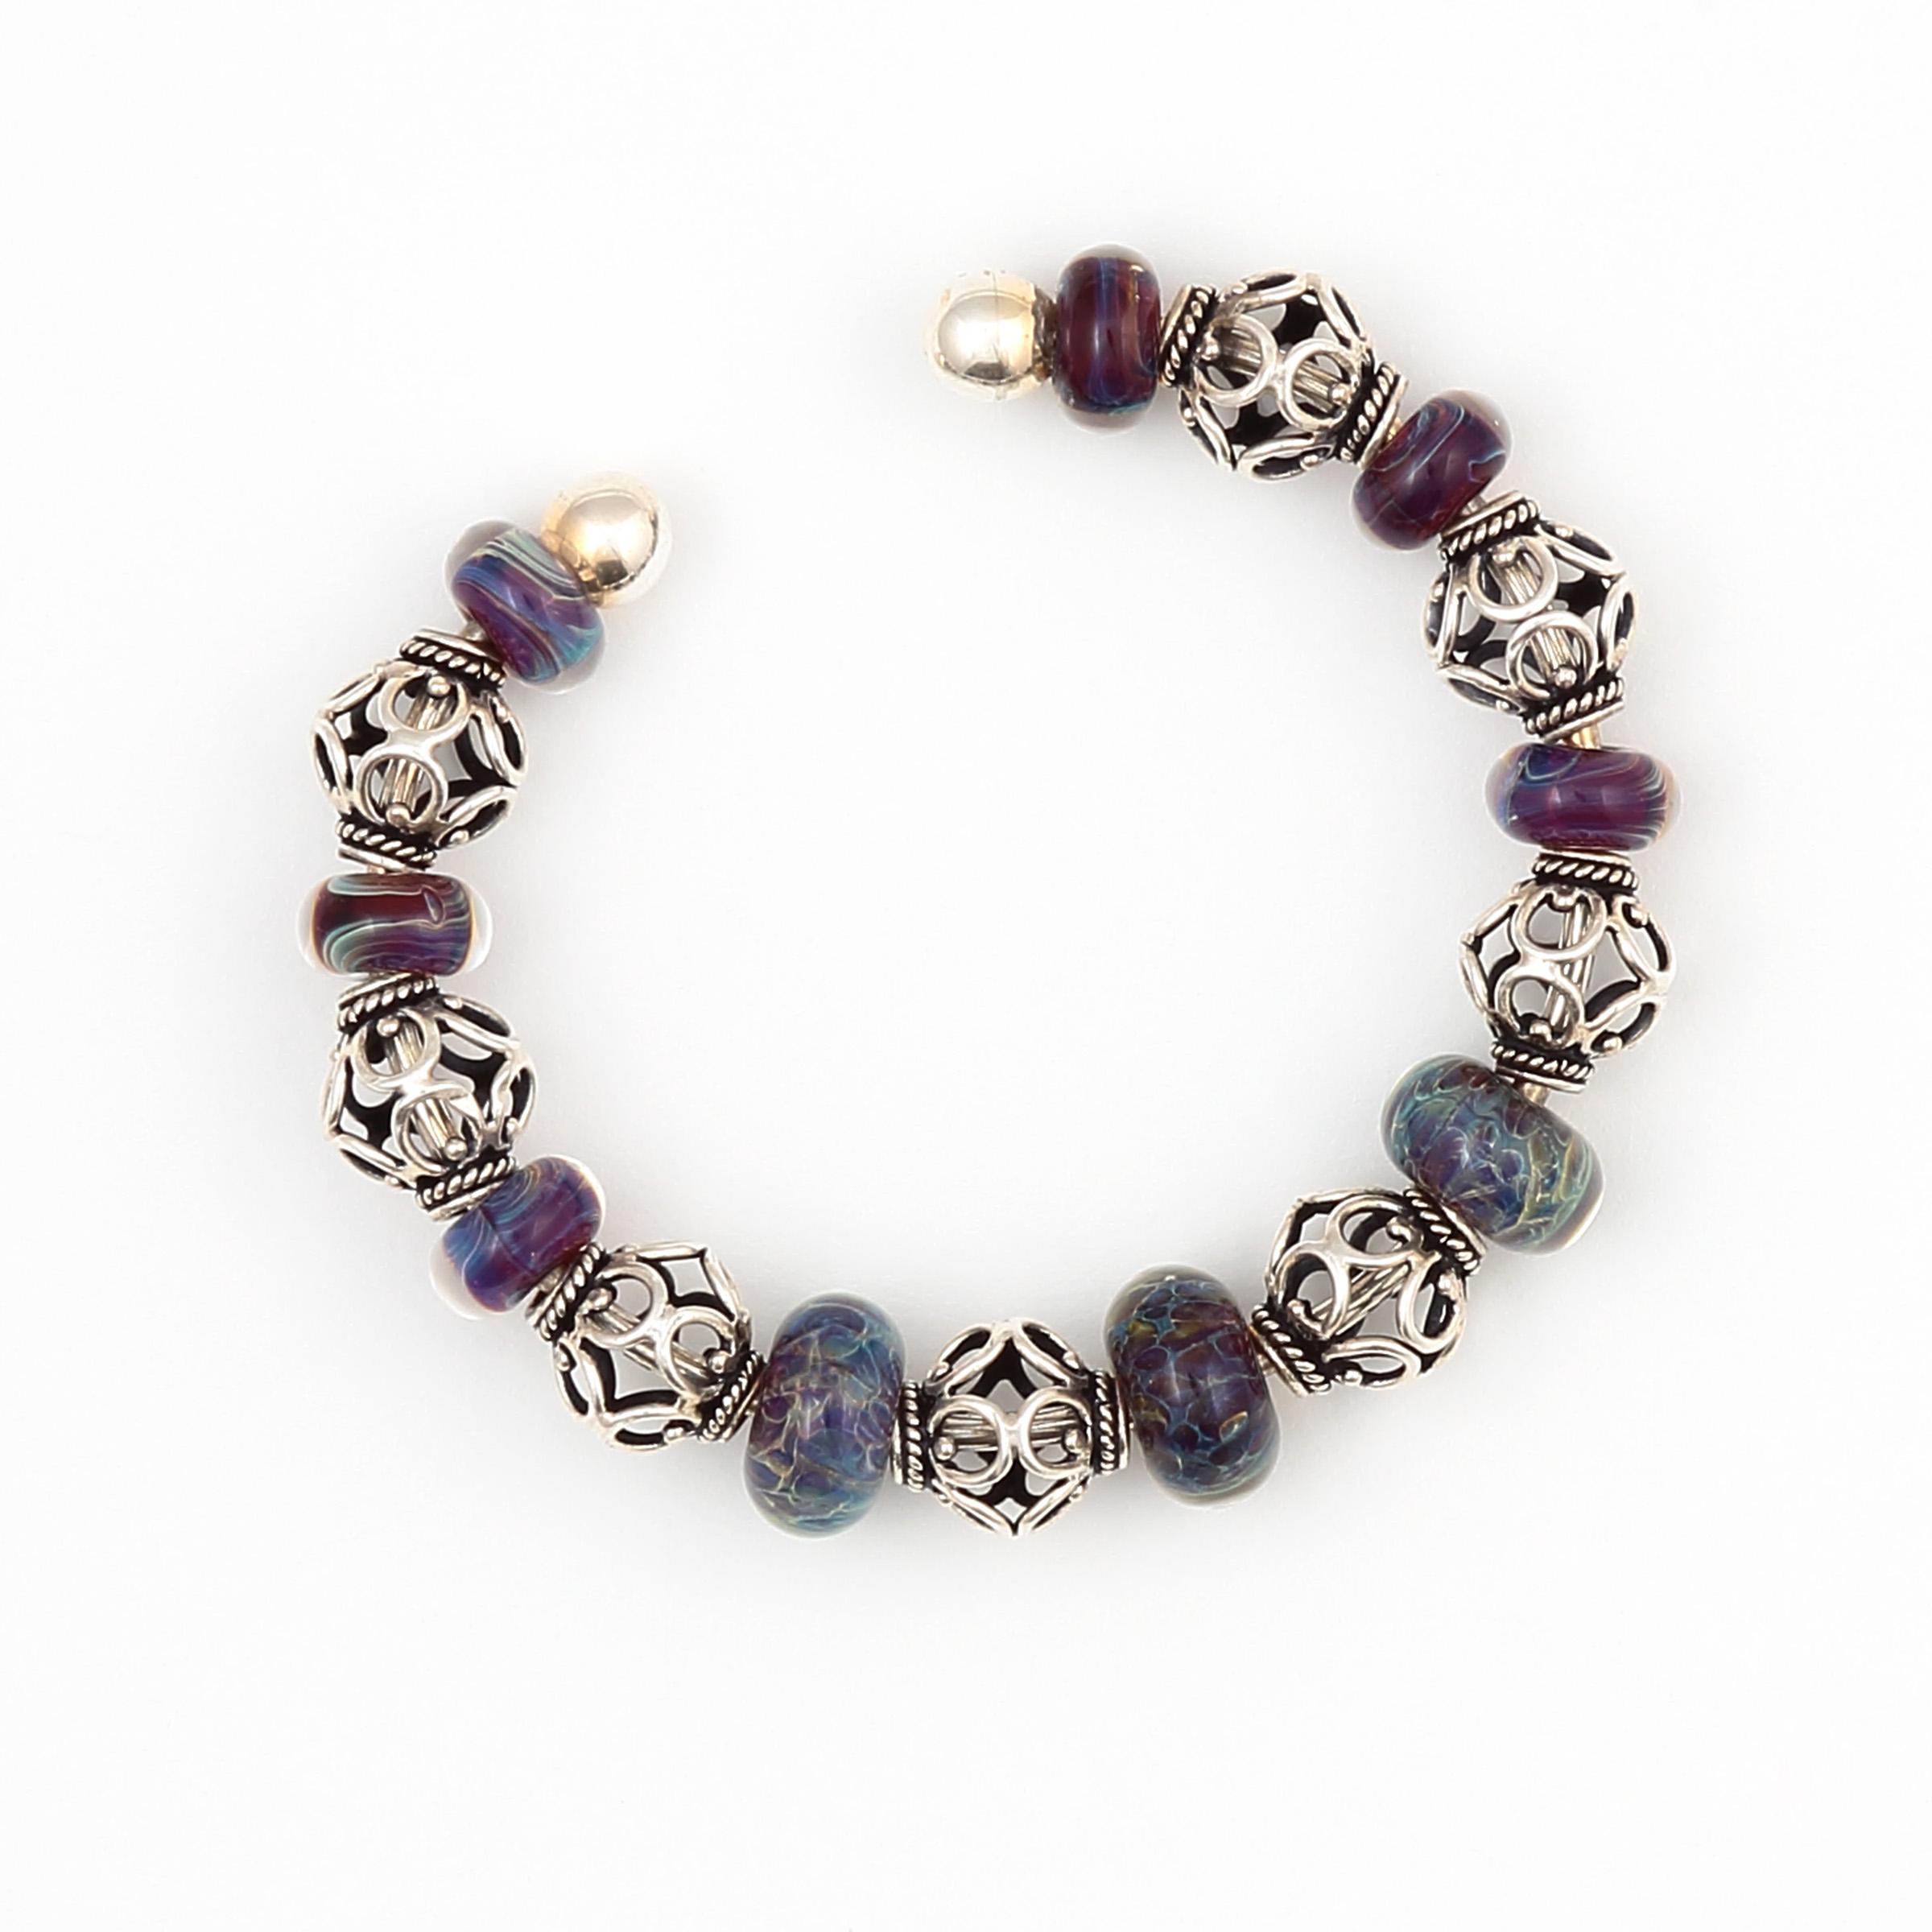 Cosmic Cuff Bracelet